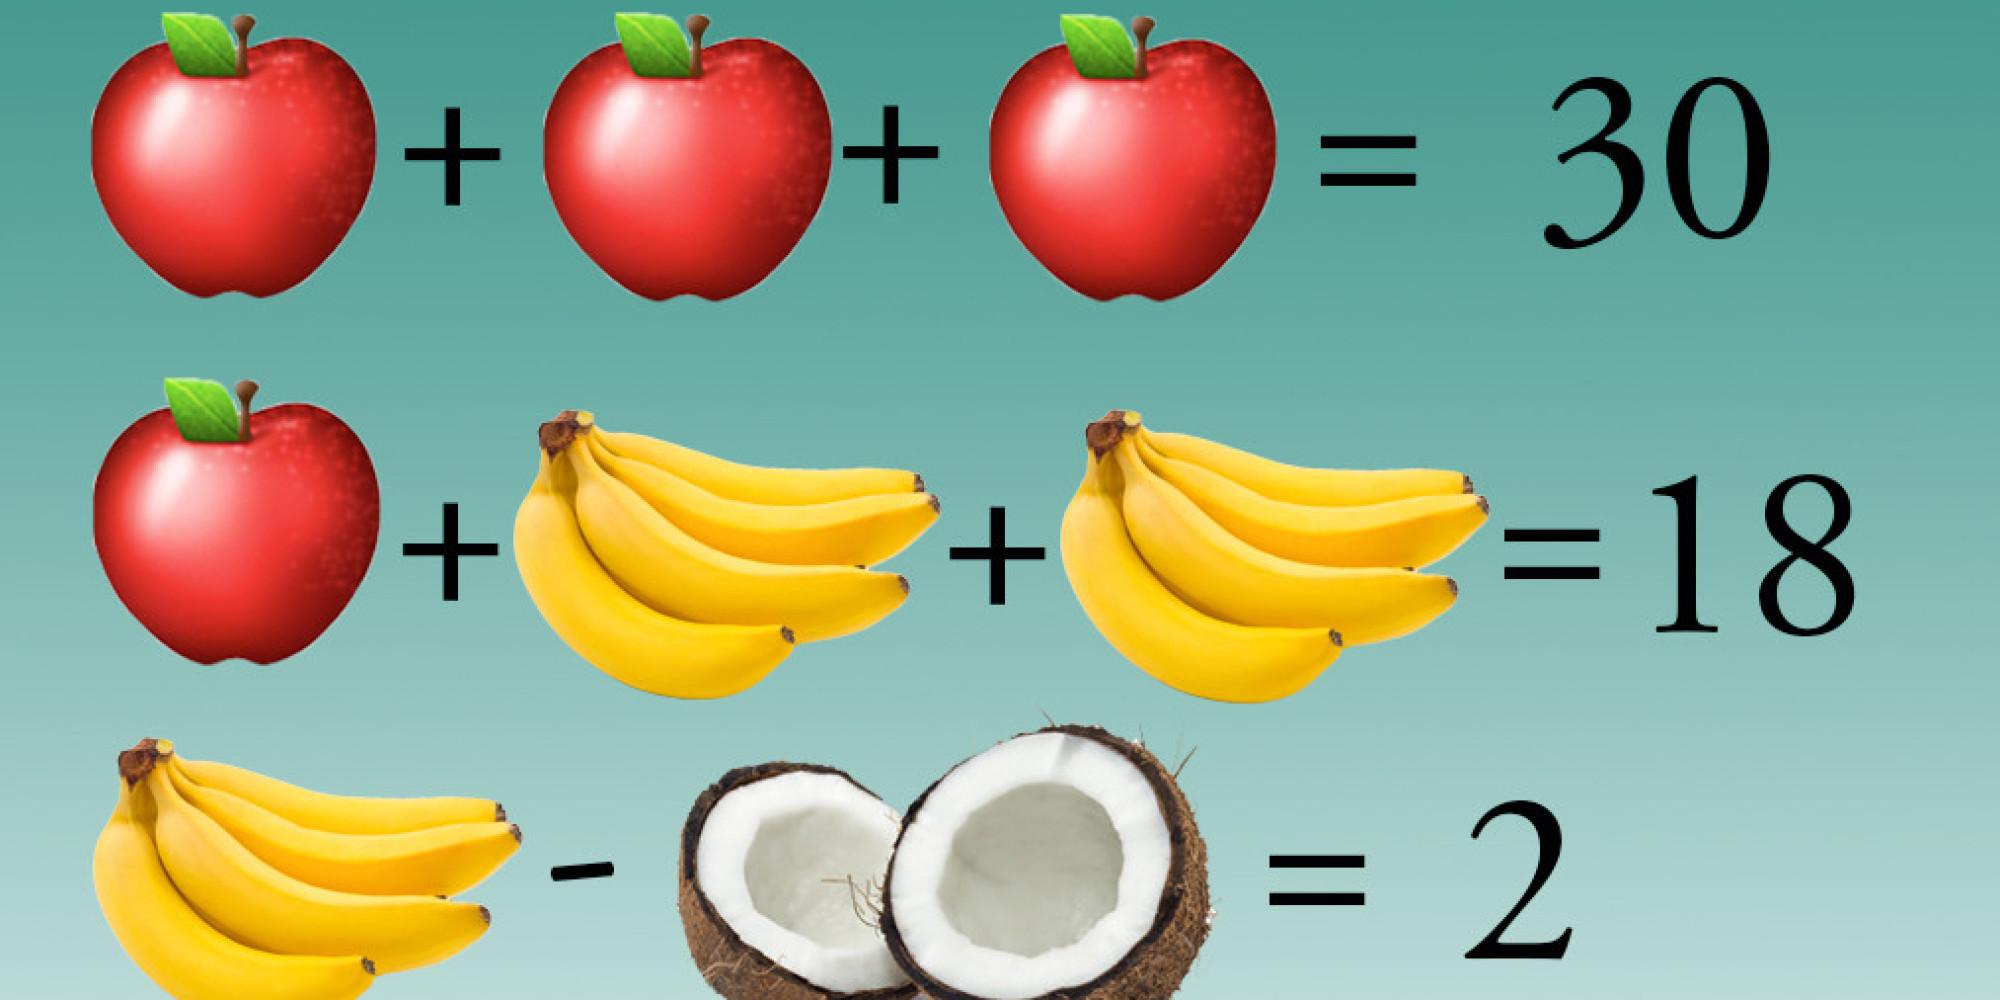 Simple Algebra Fruit Puzzle Divides Facebook Users